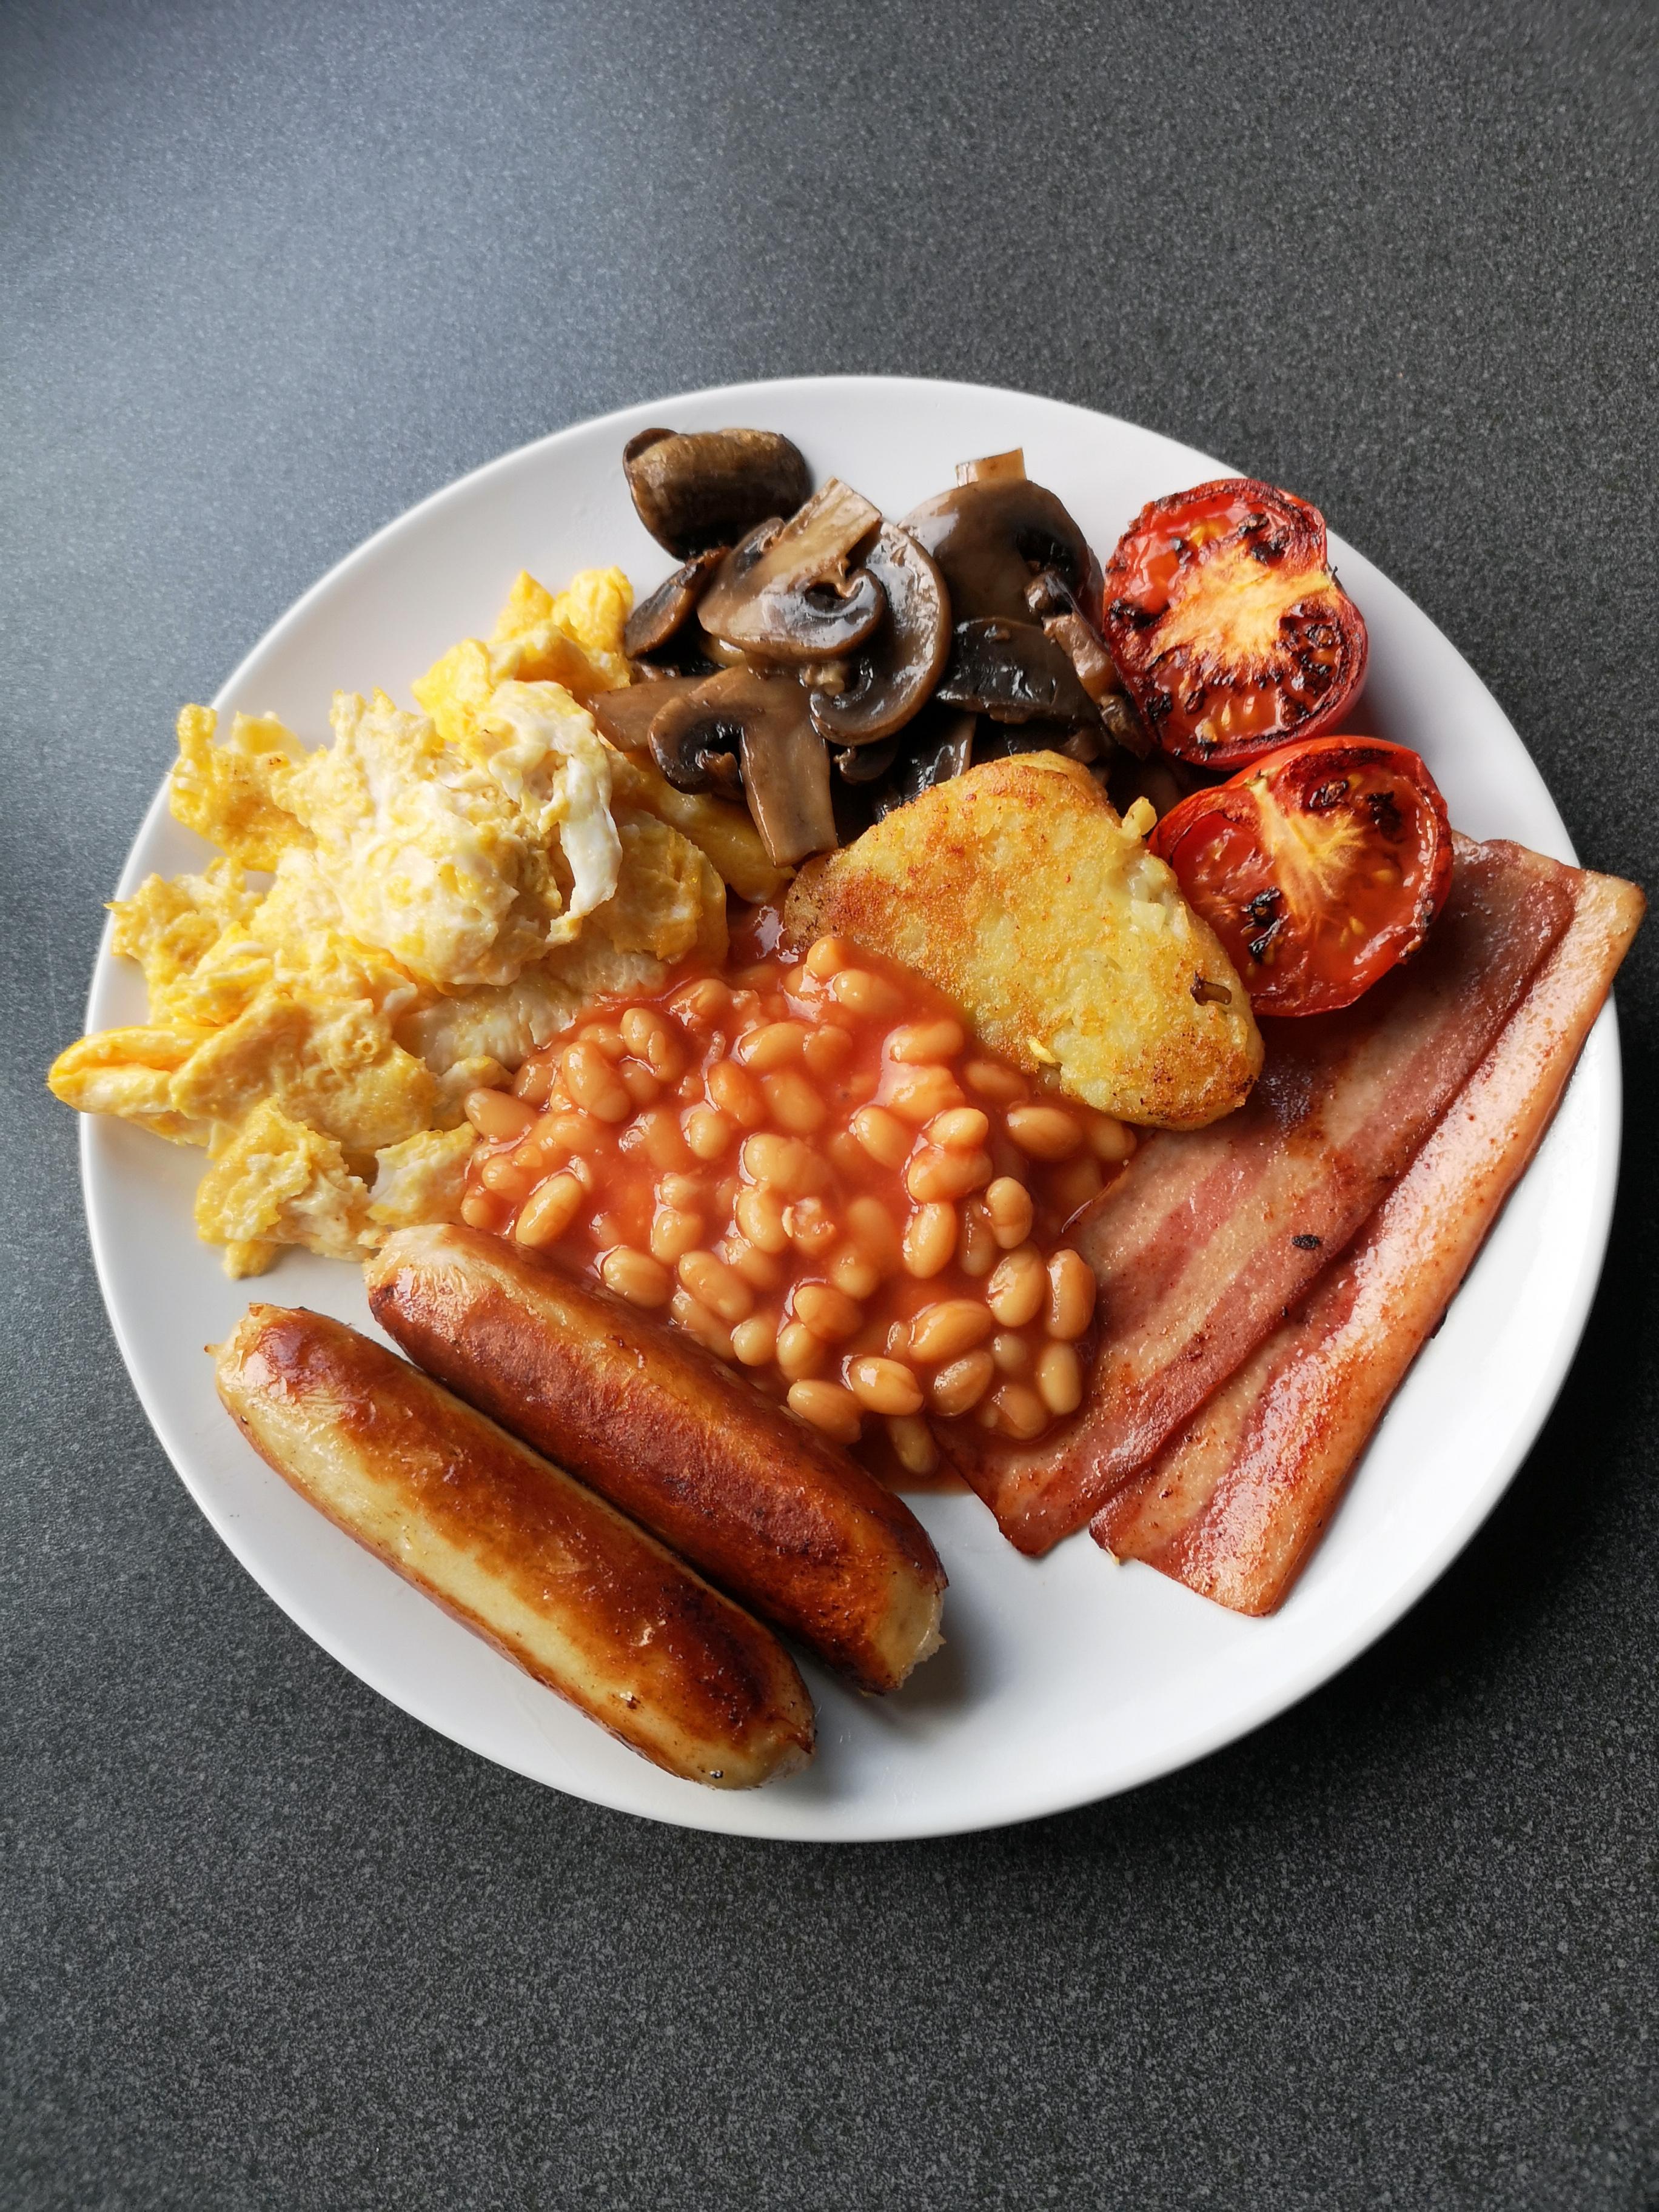 English breakfast - scrambled egg